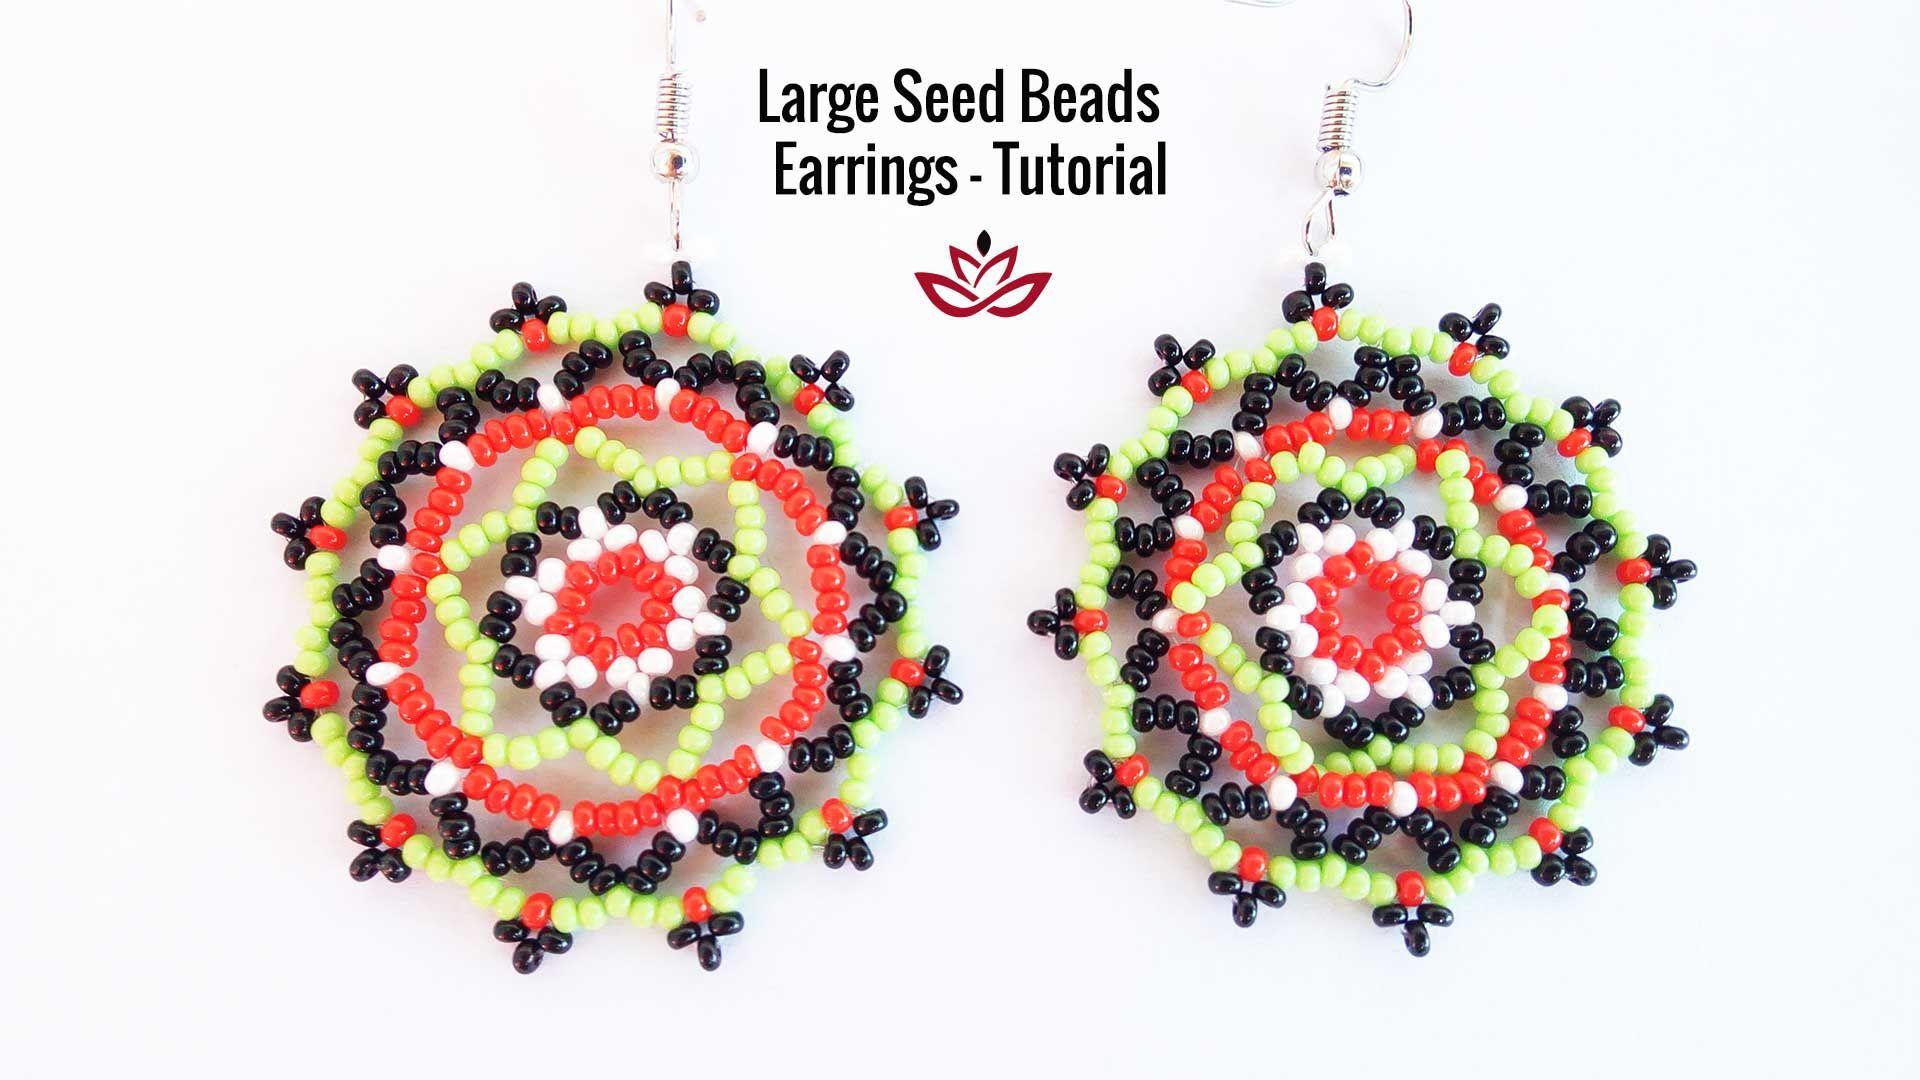 Large Seed Beads Earrings Tutorial How To Make Diy Seed Beads